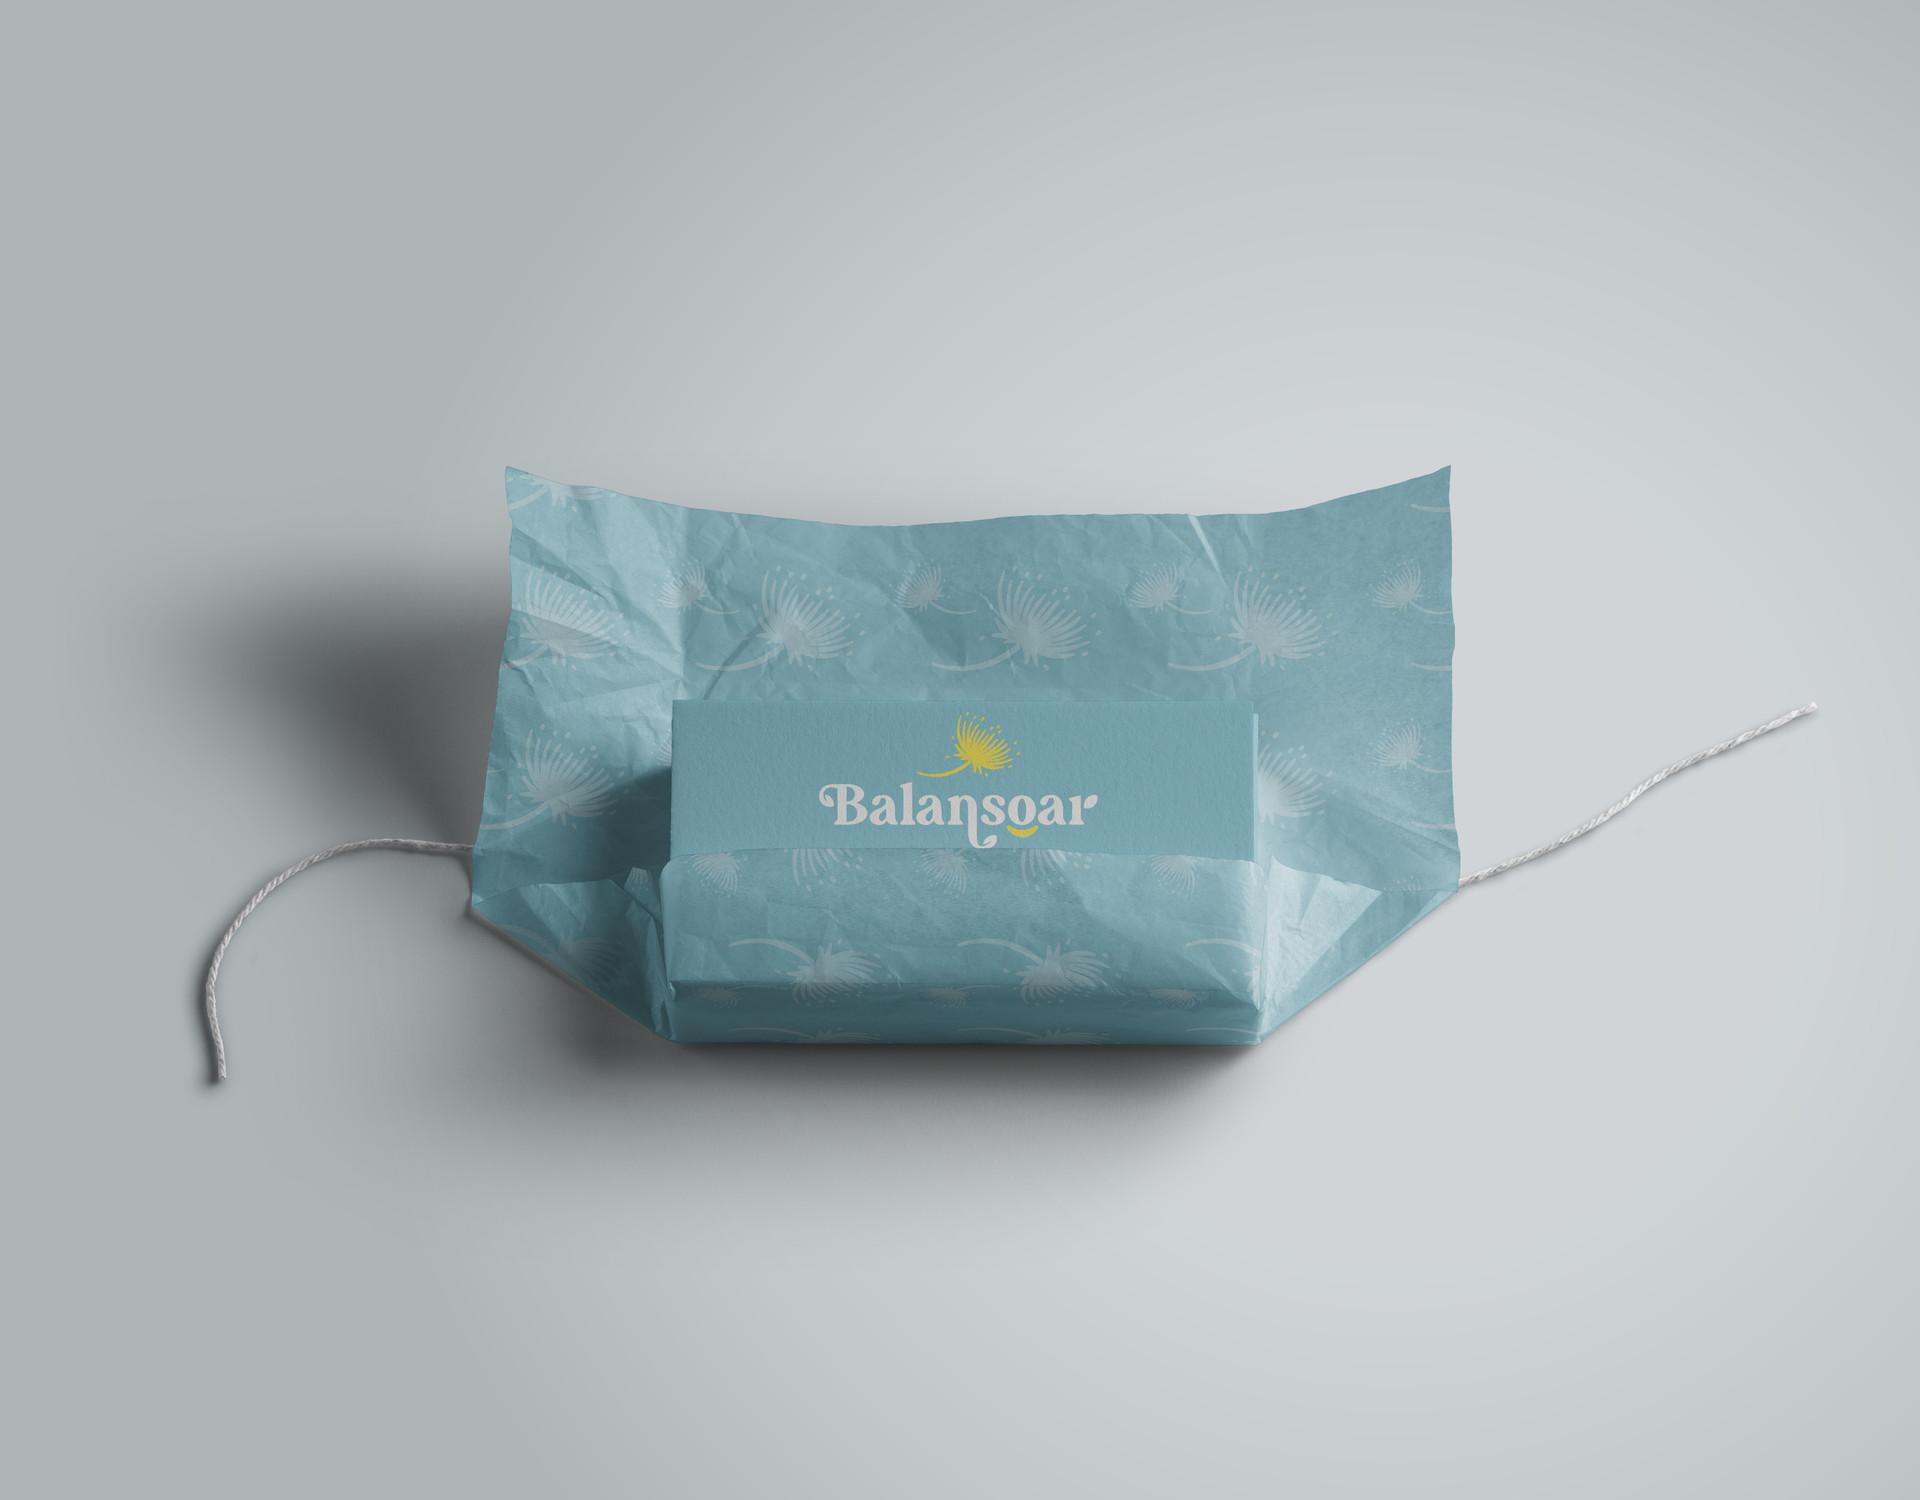 [Balansoar] Invitation-Card-Mockup-02.jp